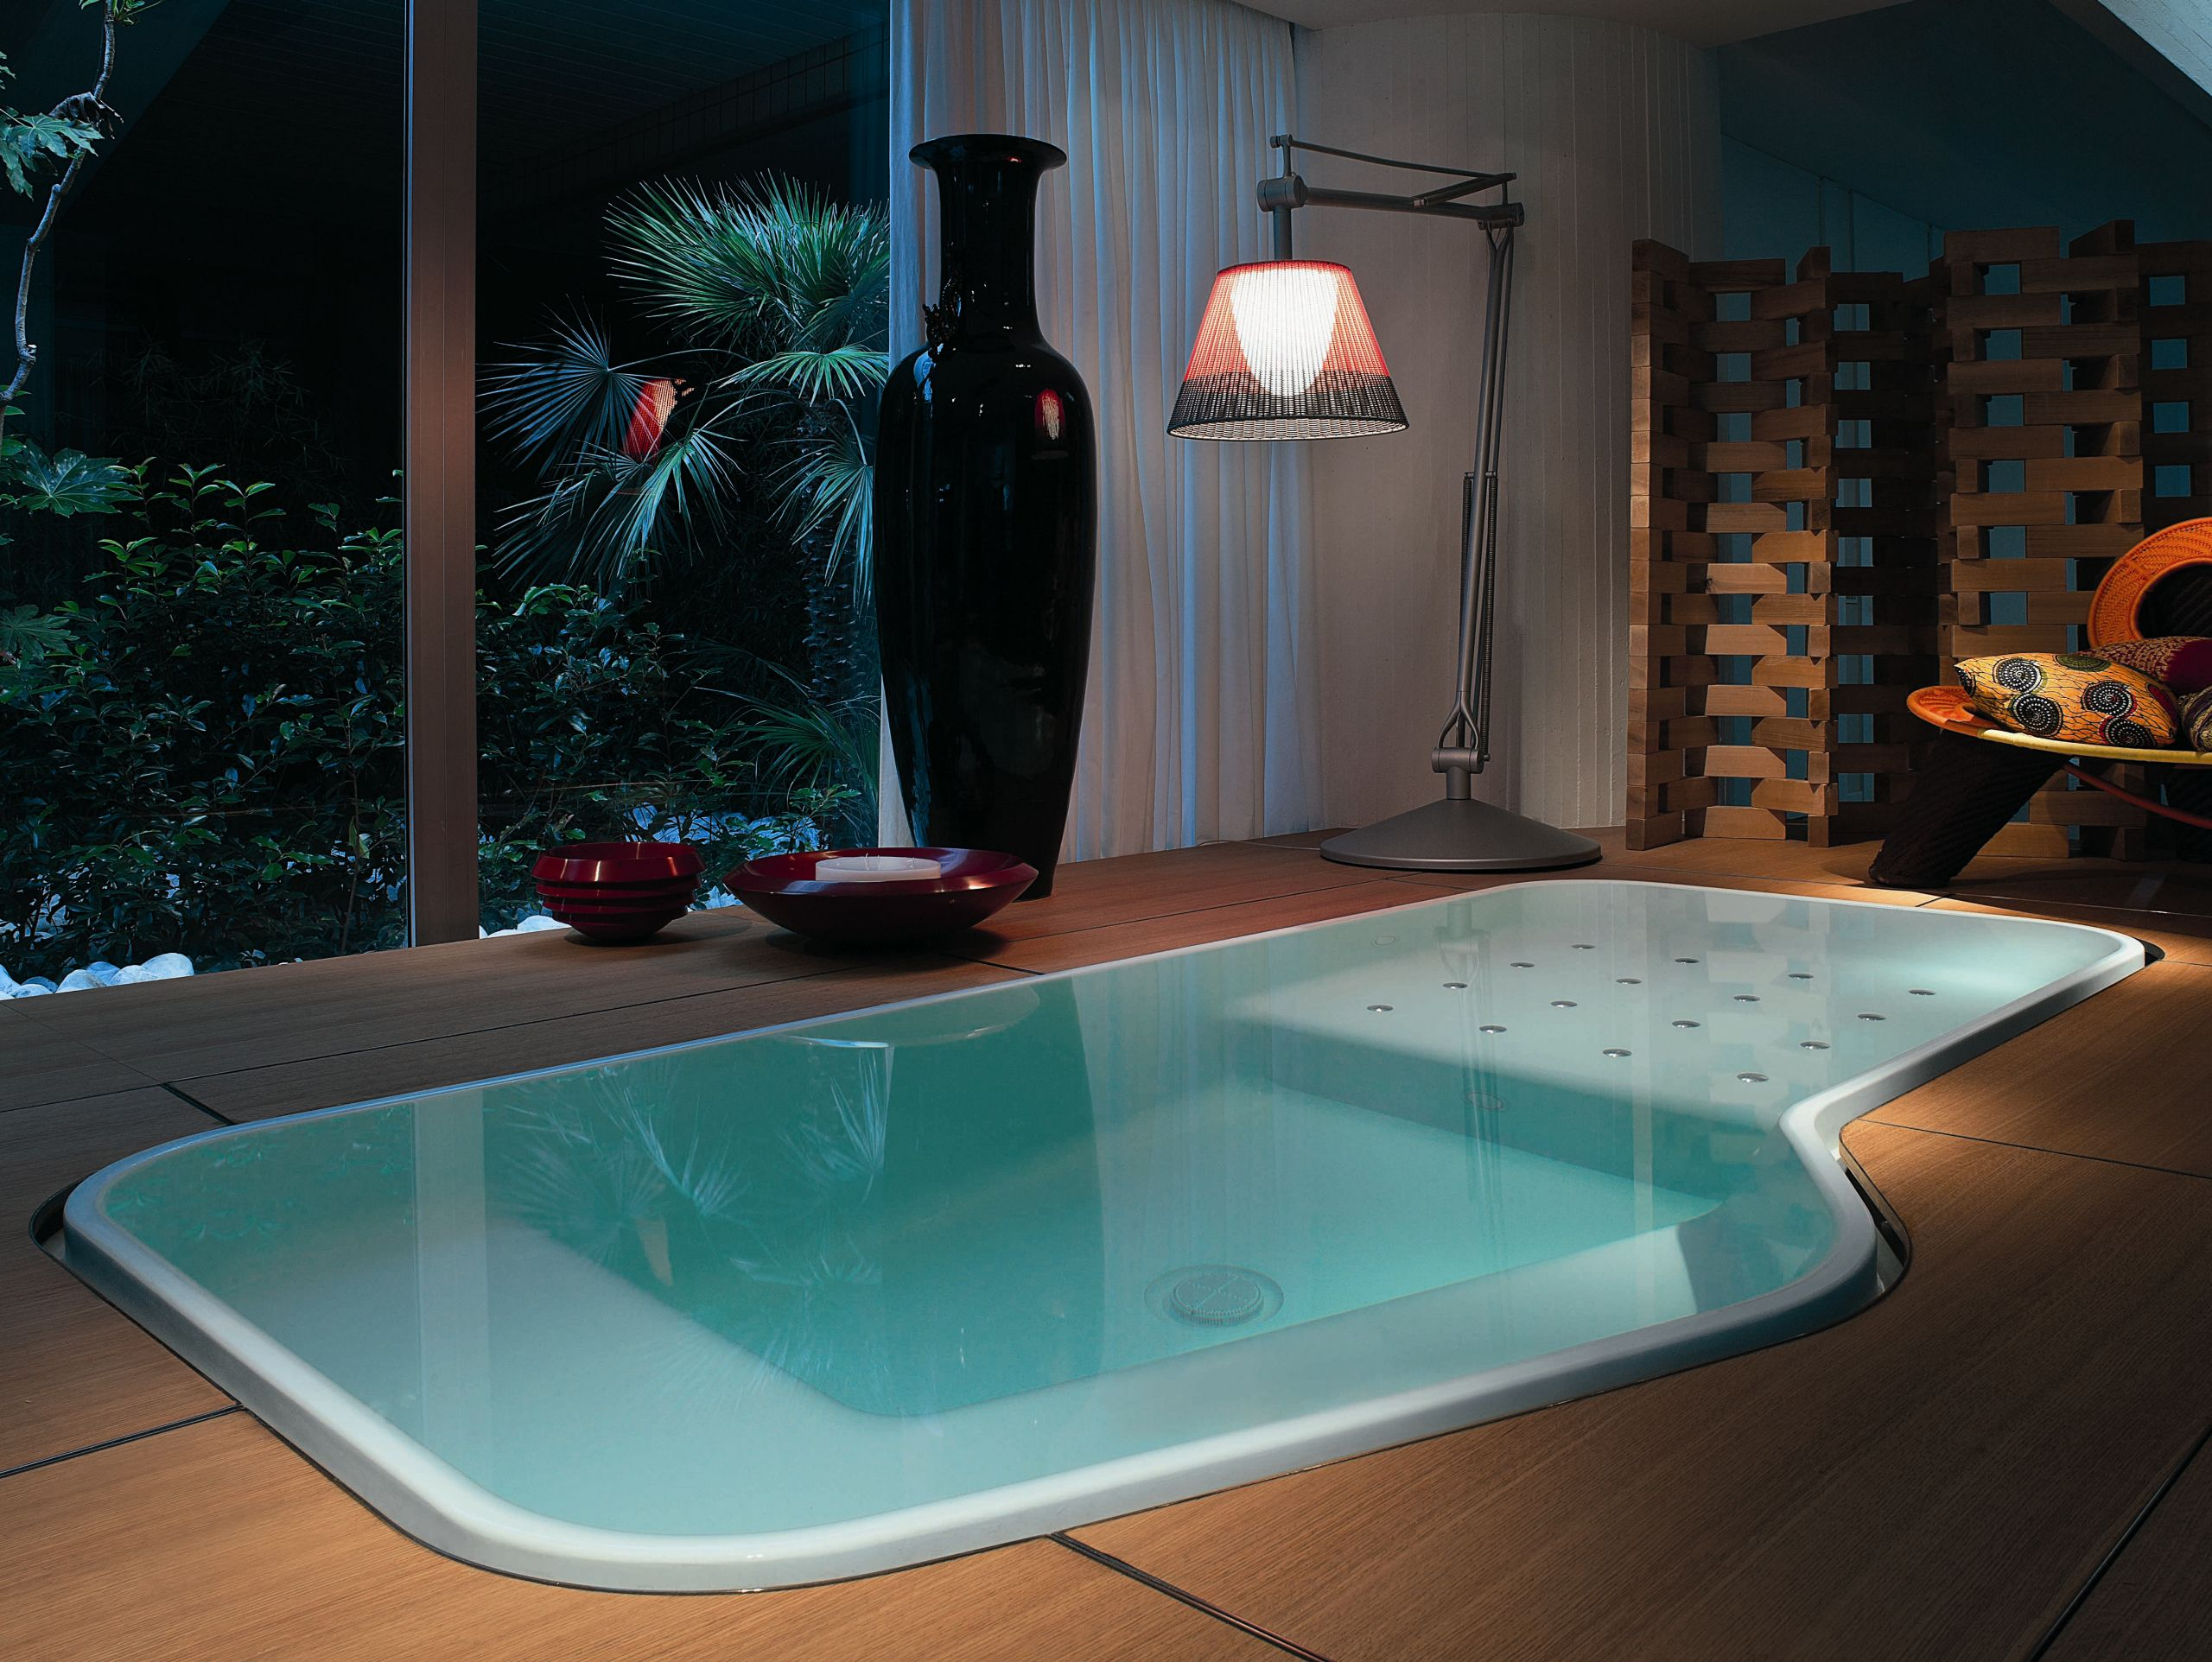 Faraway Indoor Outdoor Pool Spa By Kos Spa Room Indoor Outdoor Pool Home